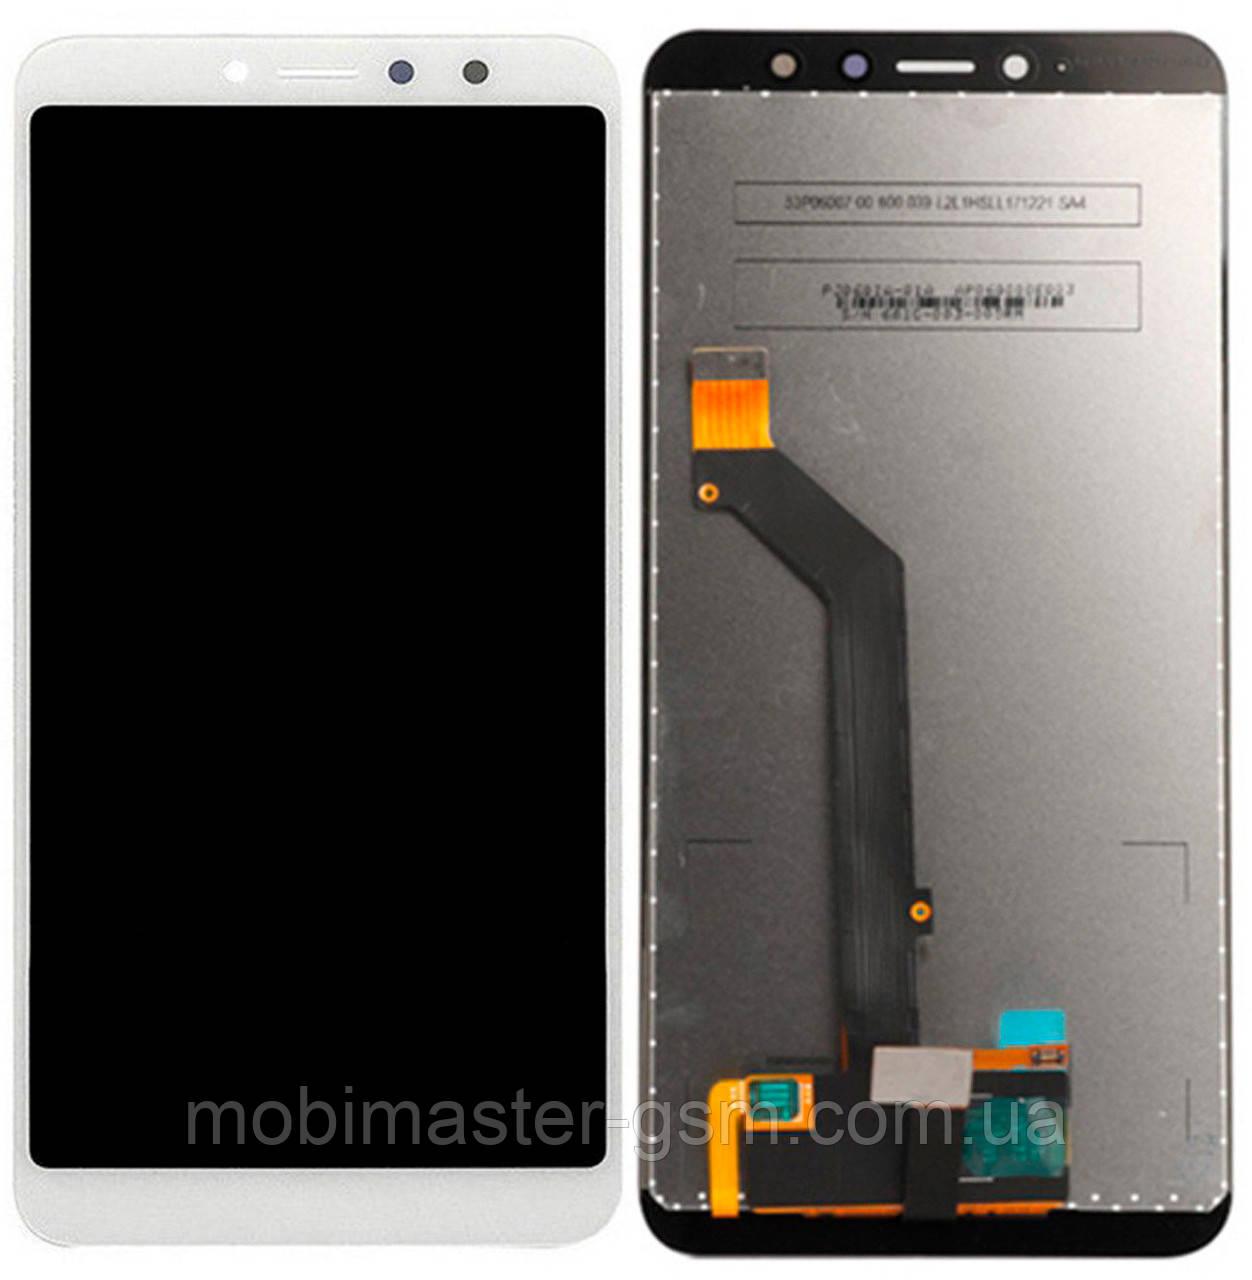 LCD модуль Xiaomi Redmi S2 white